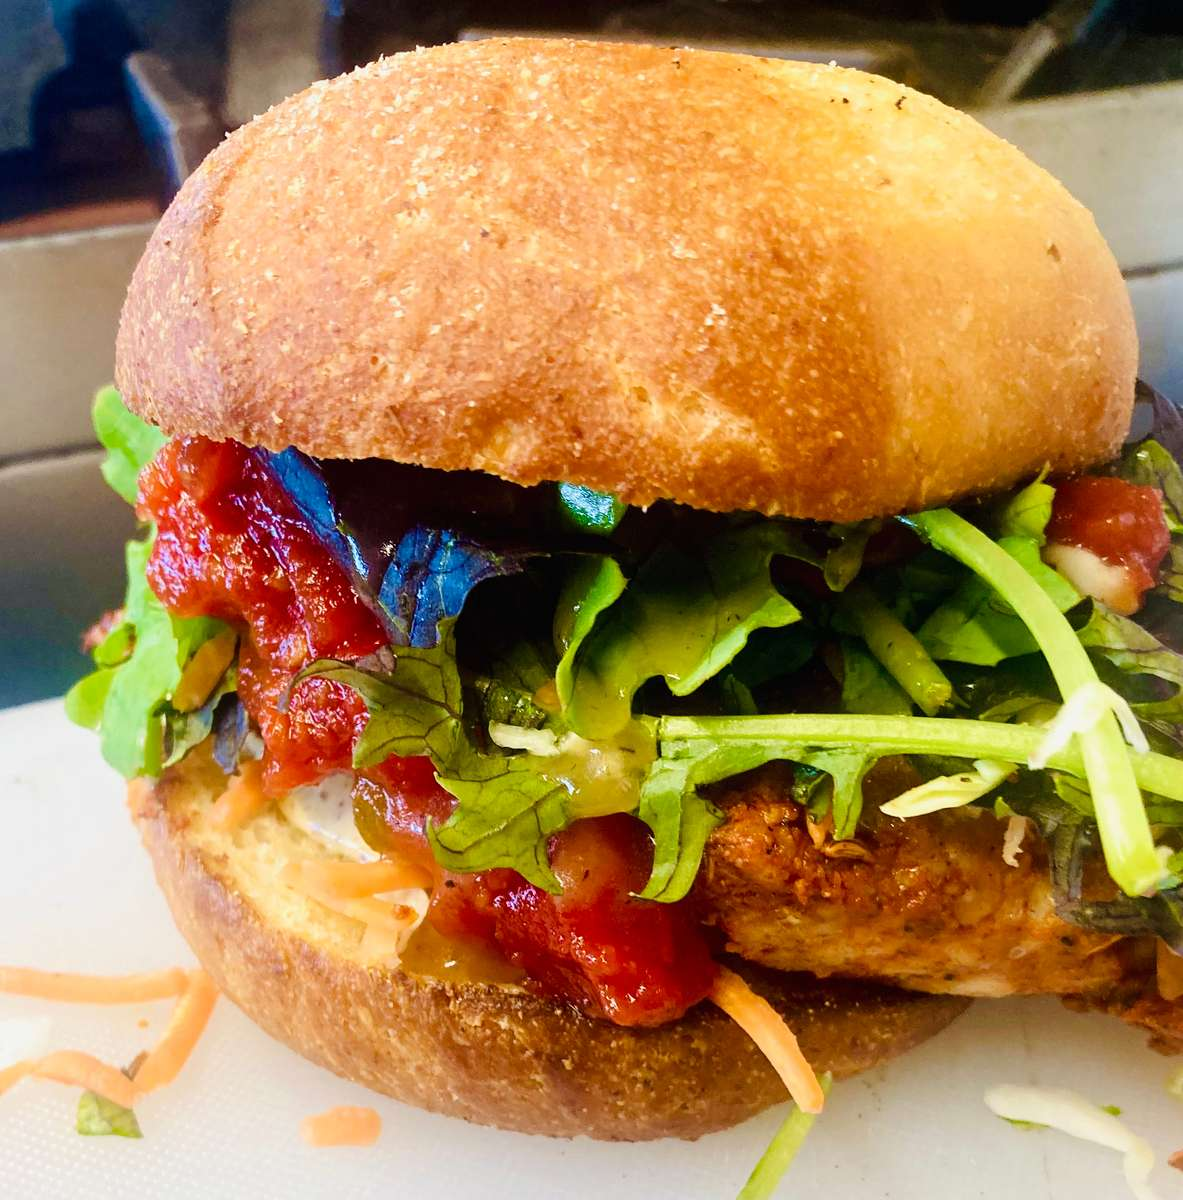 Blackened Red Fish Sandwich